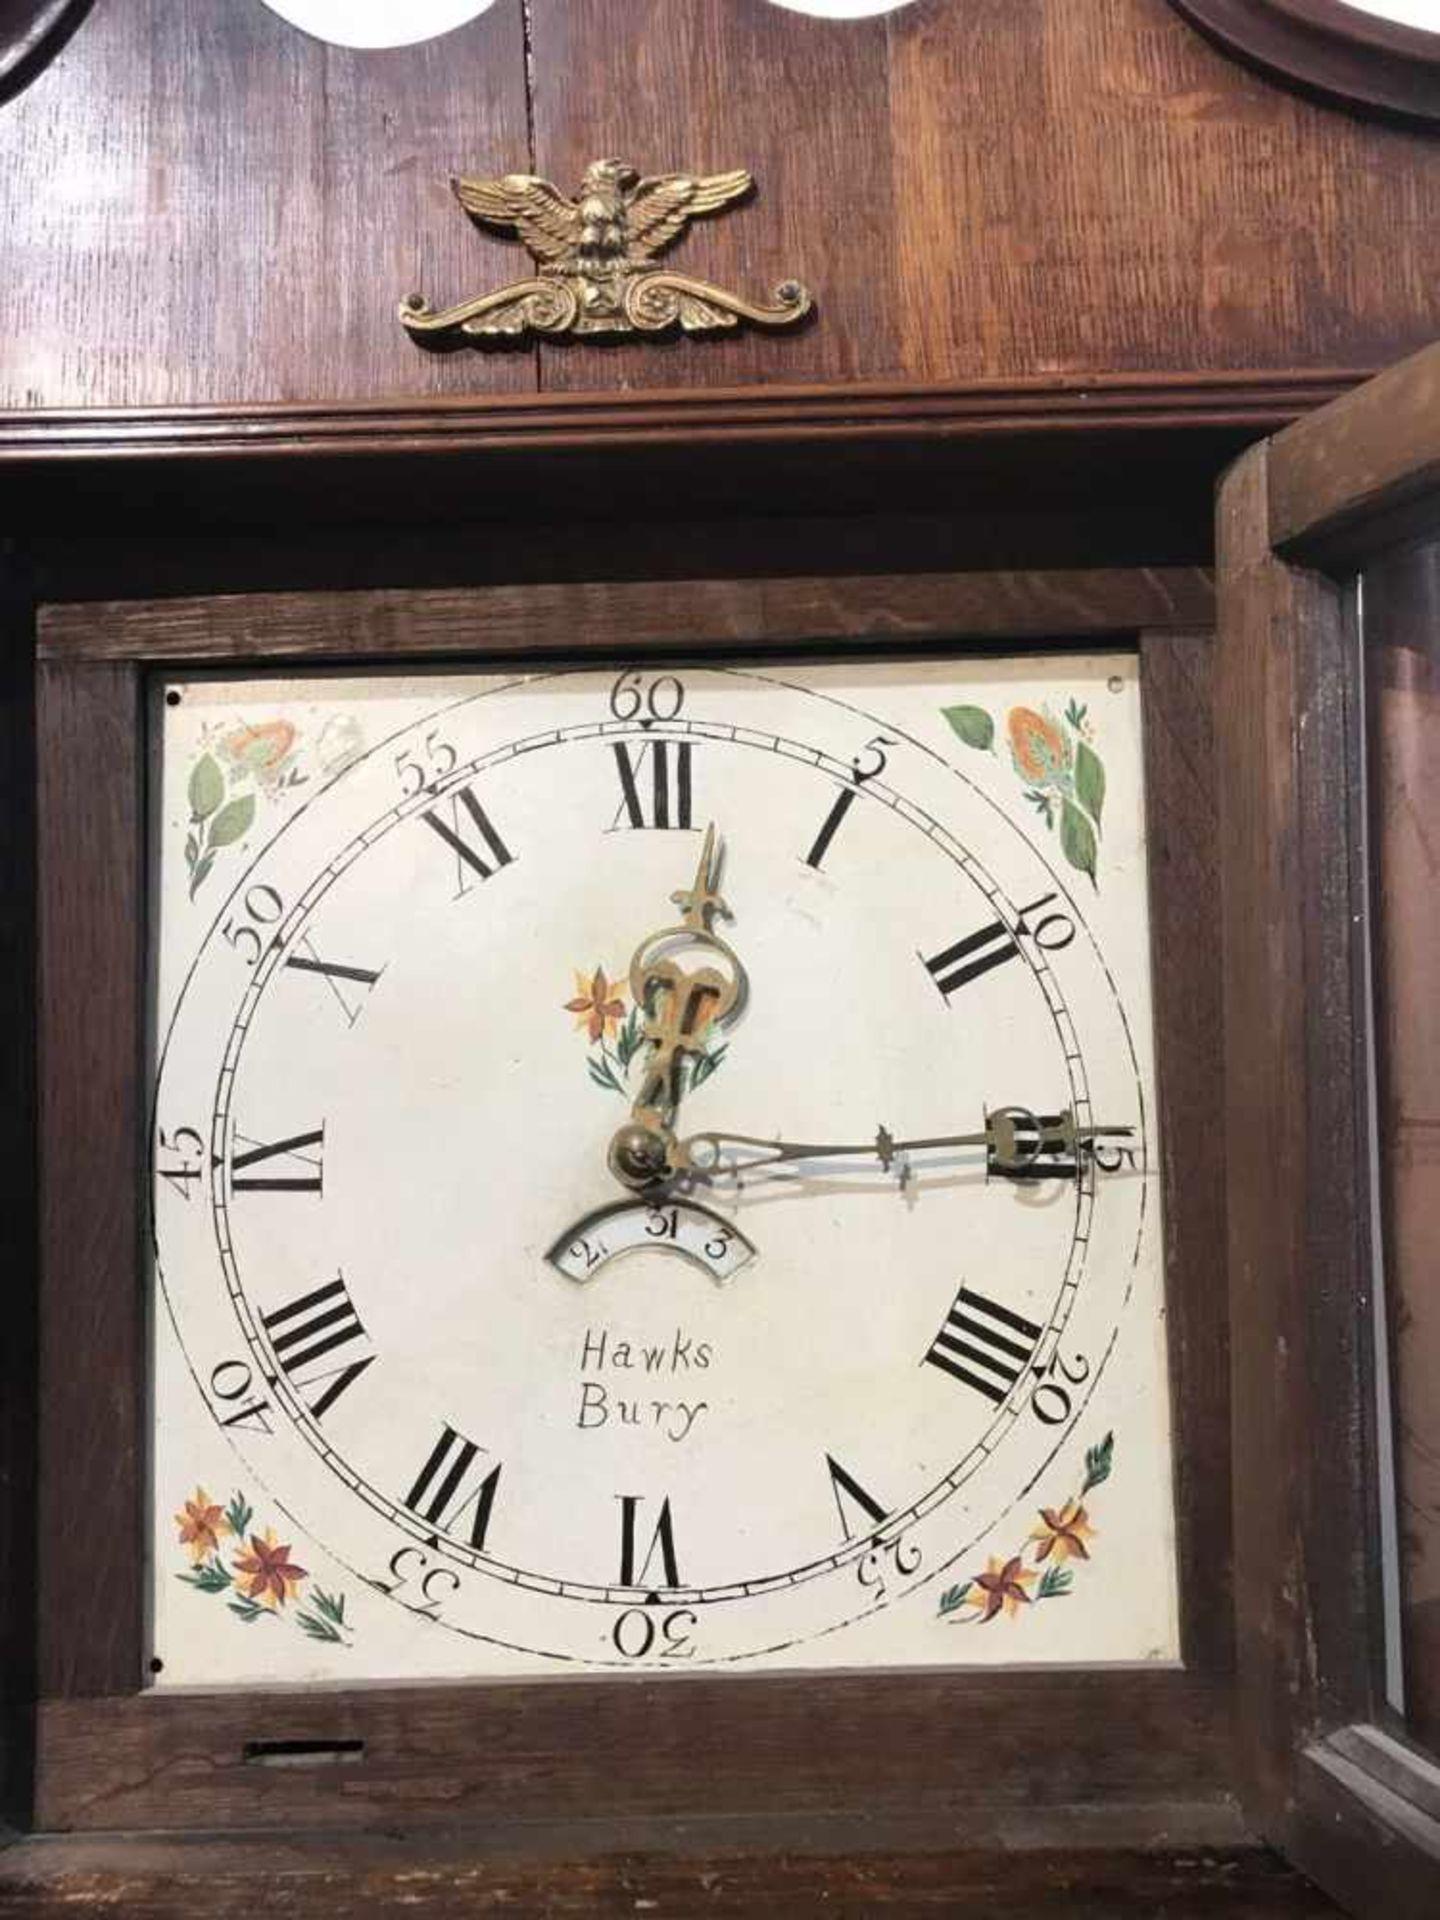 Los 191 - English standing clock Hawks Bury English standing clock Hawks Bury